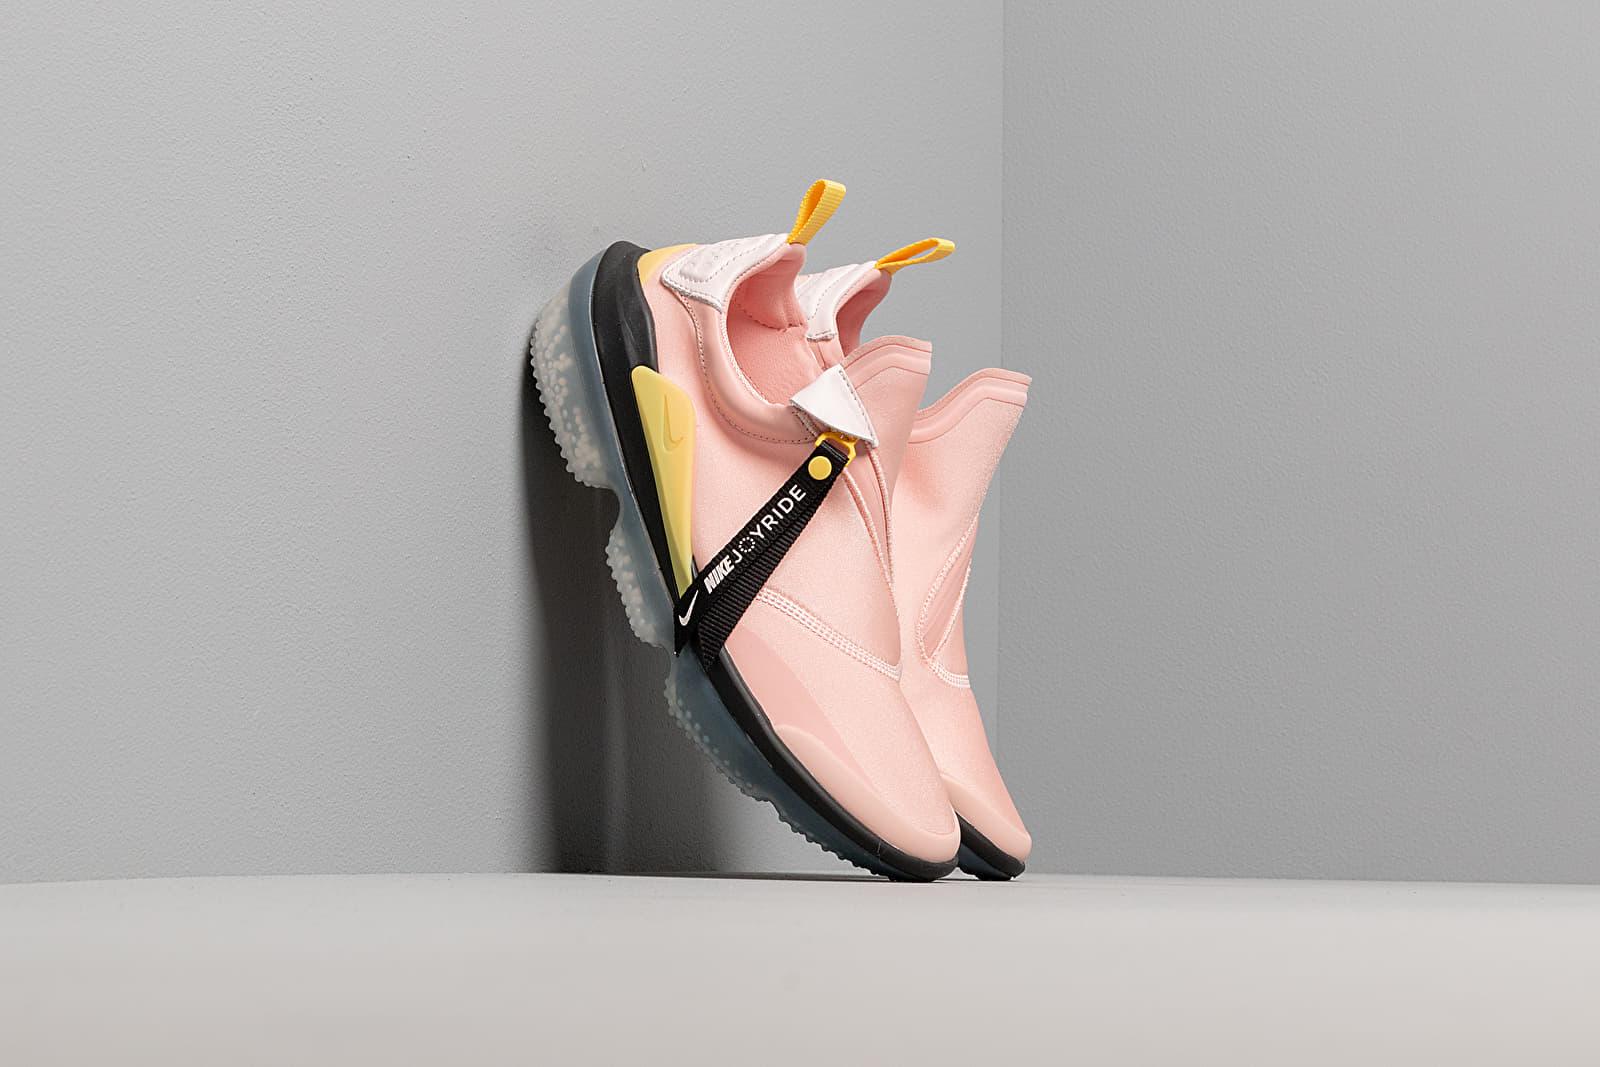 Frauen Nike W Joyride Optik Coral Stardust/ Chrome Yellow